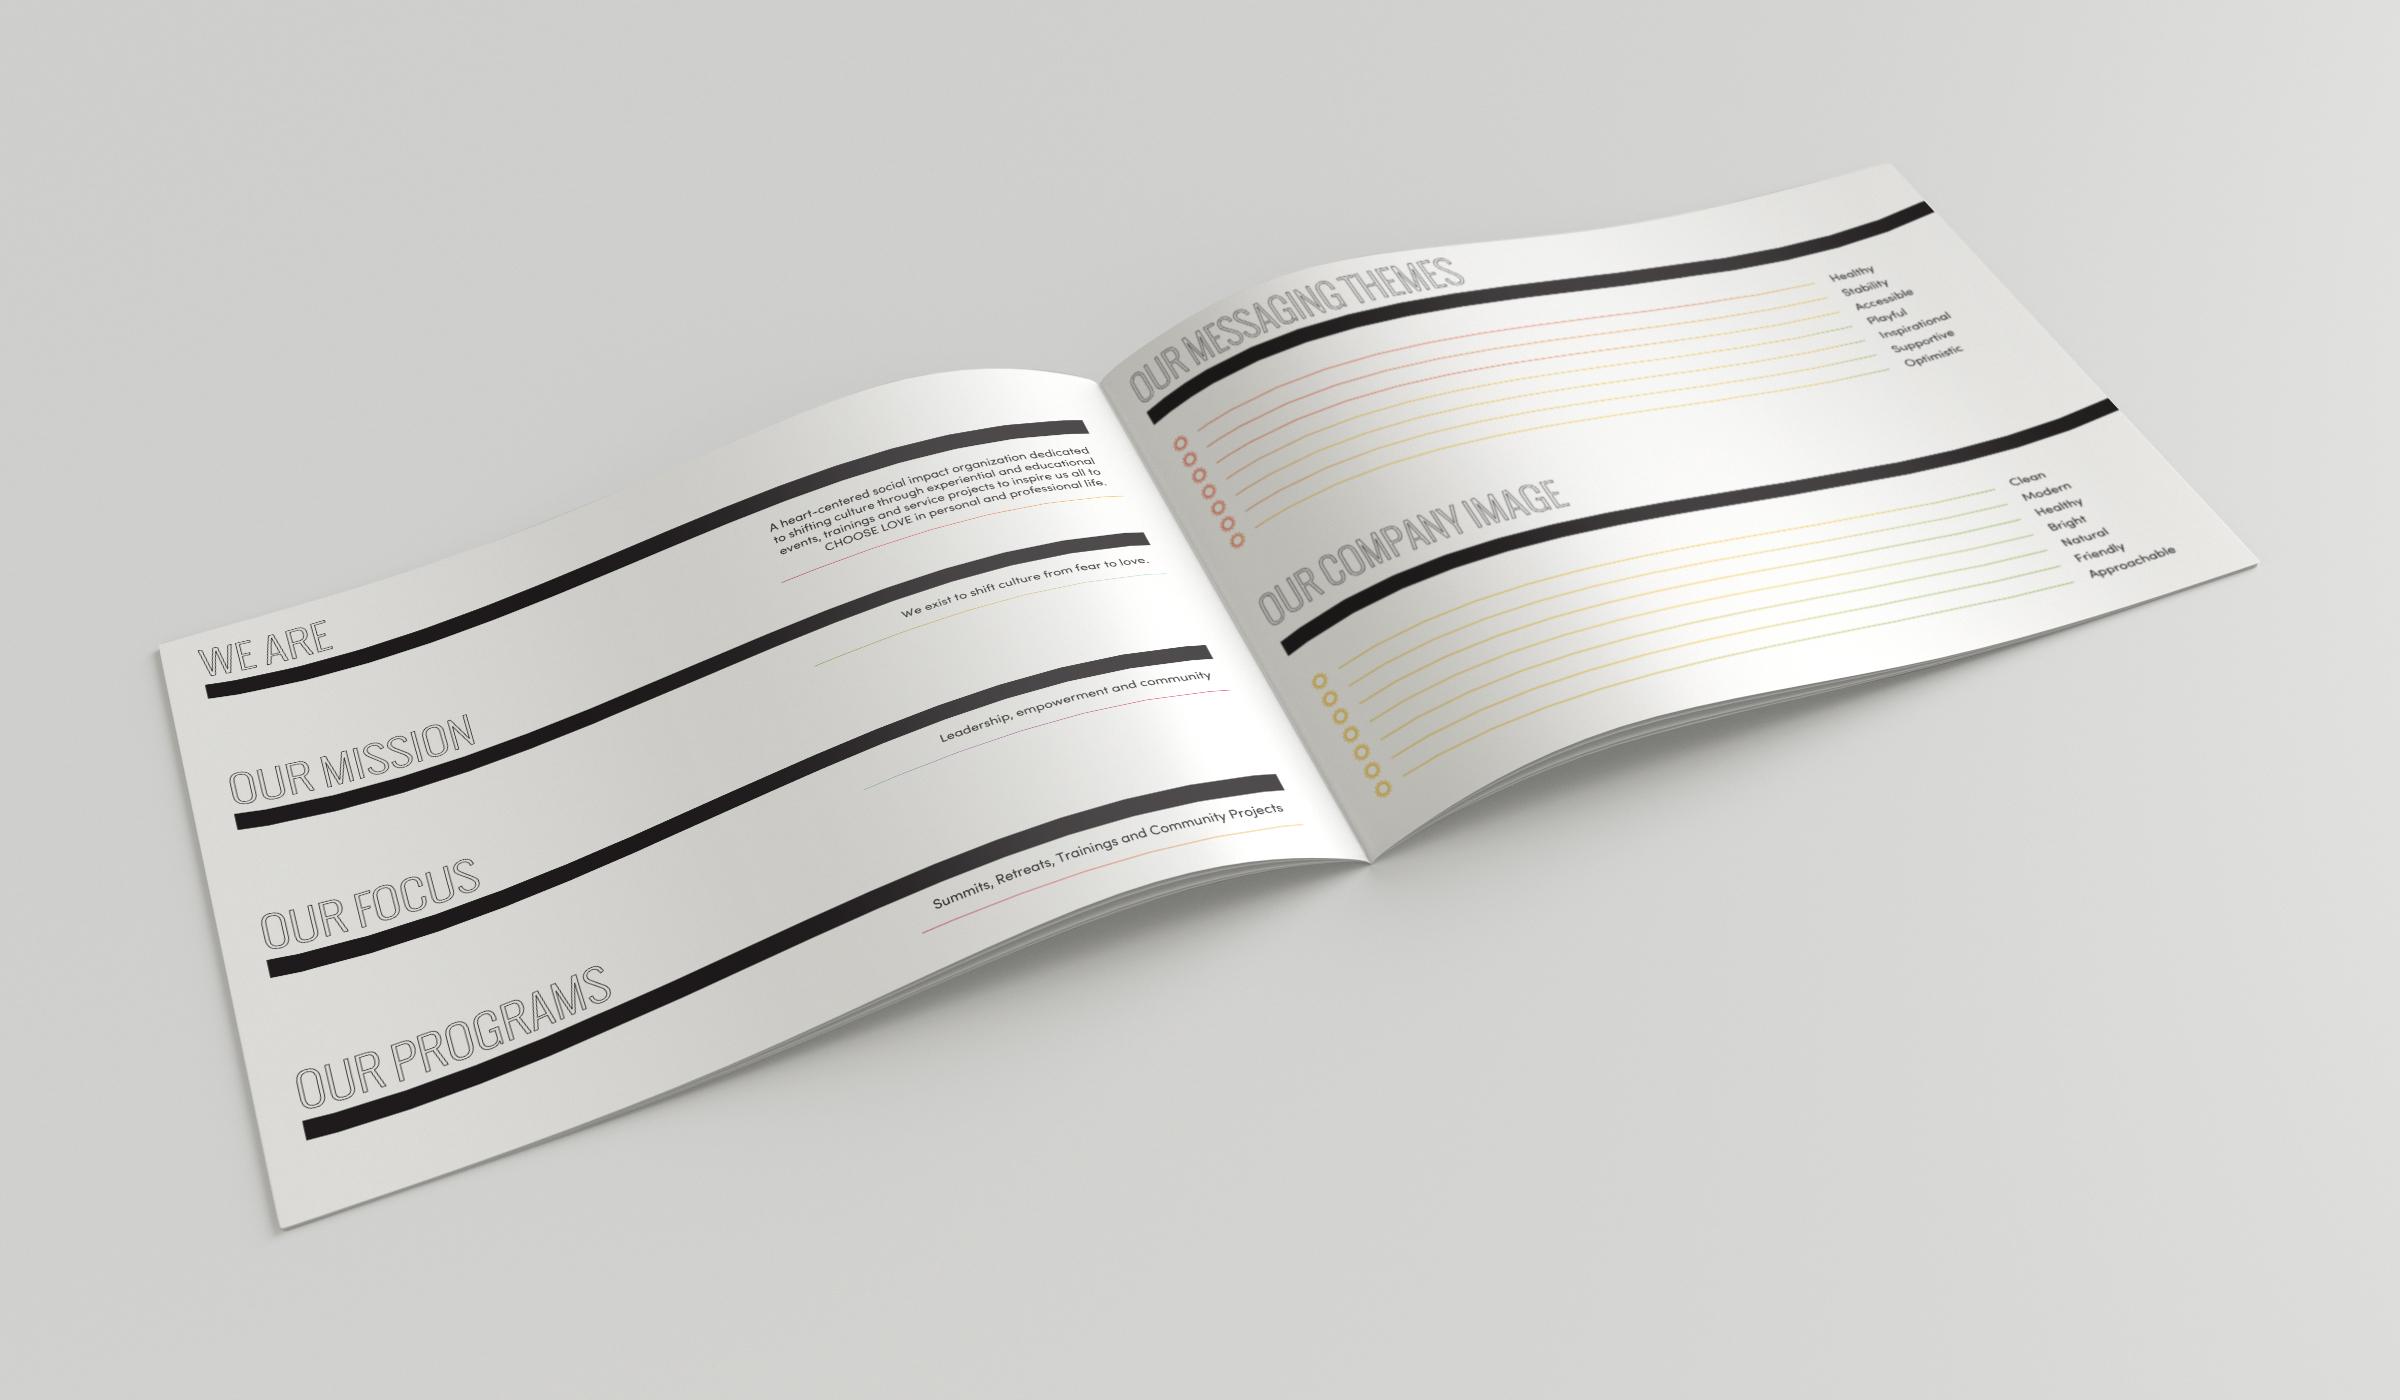 aspen lead with love erica simon graphic designer